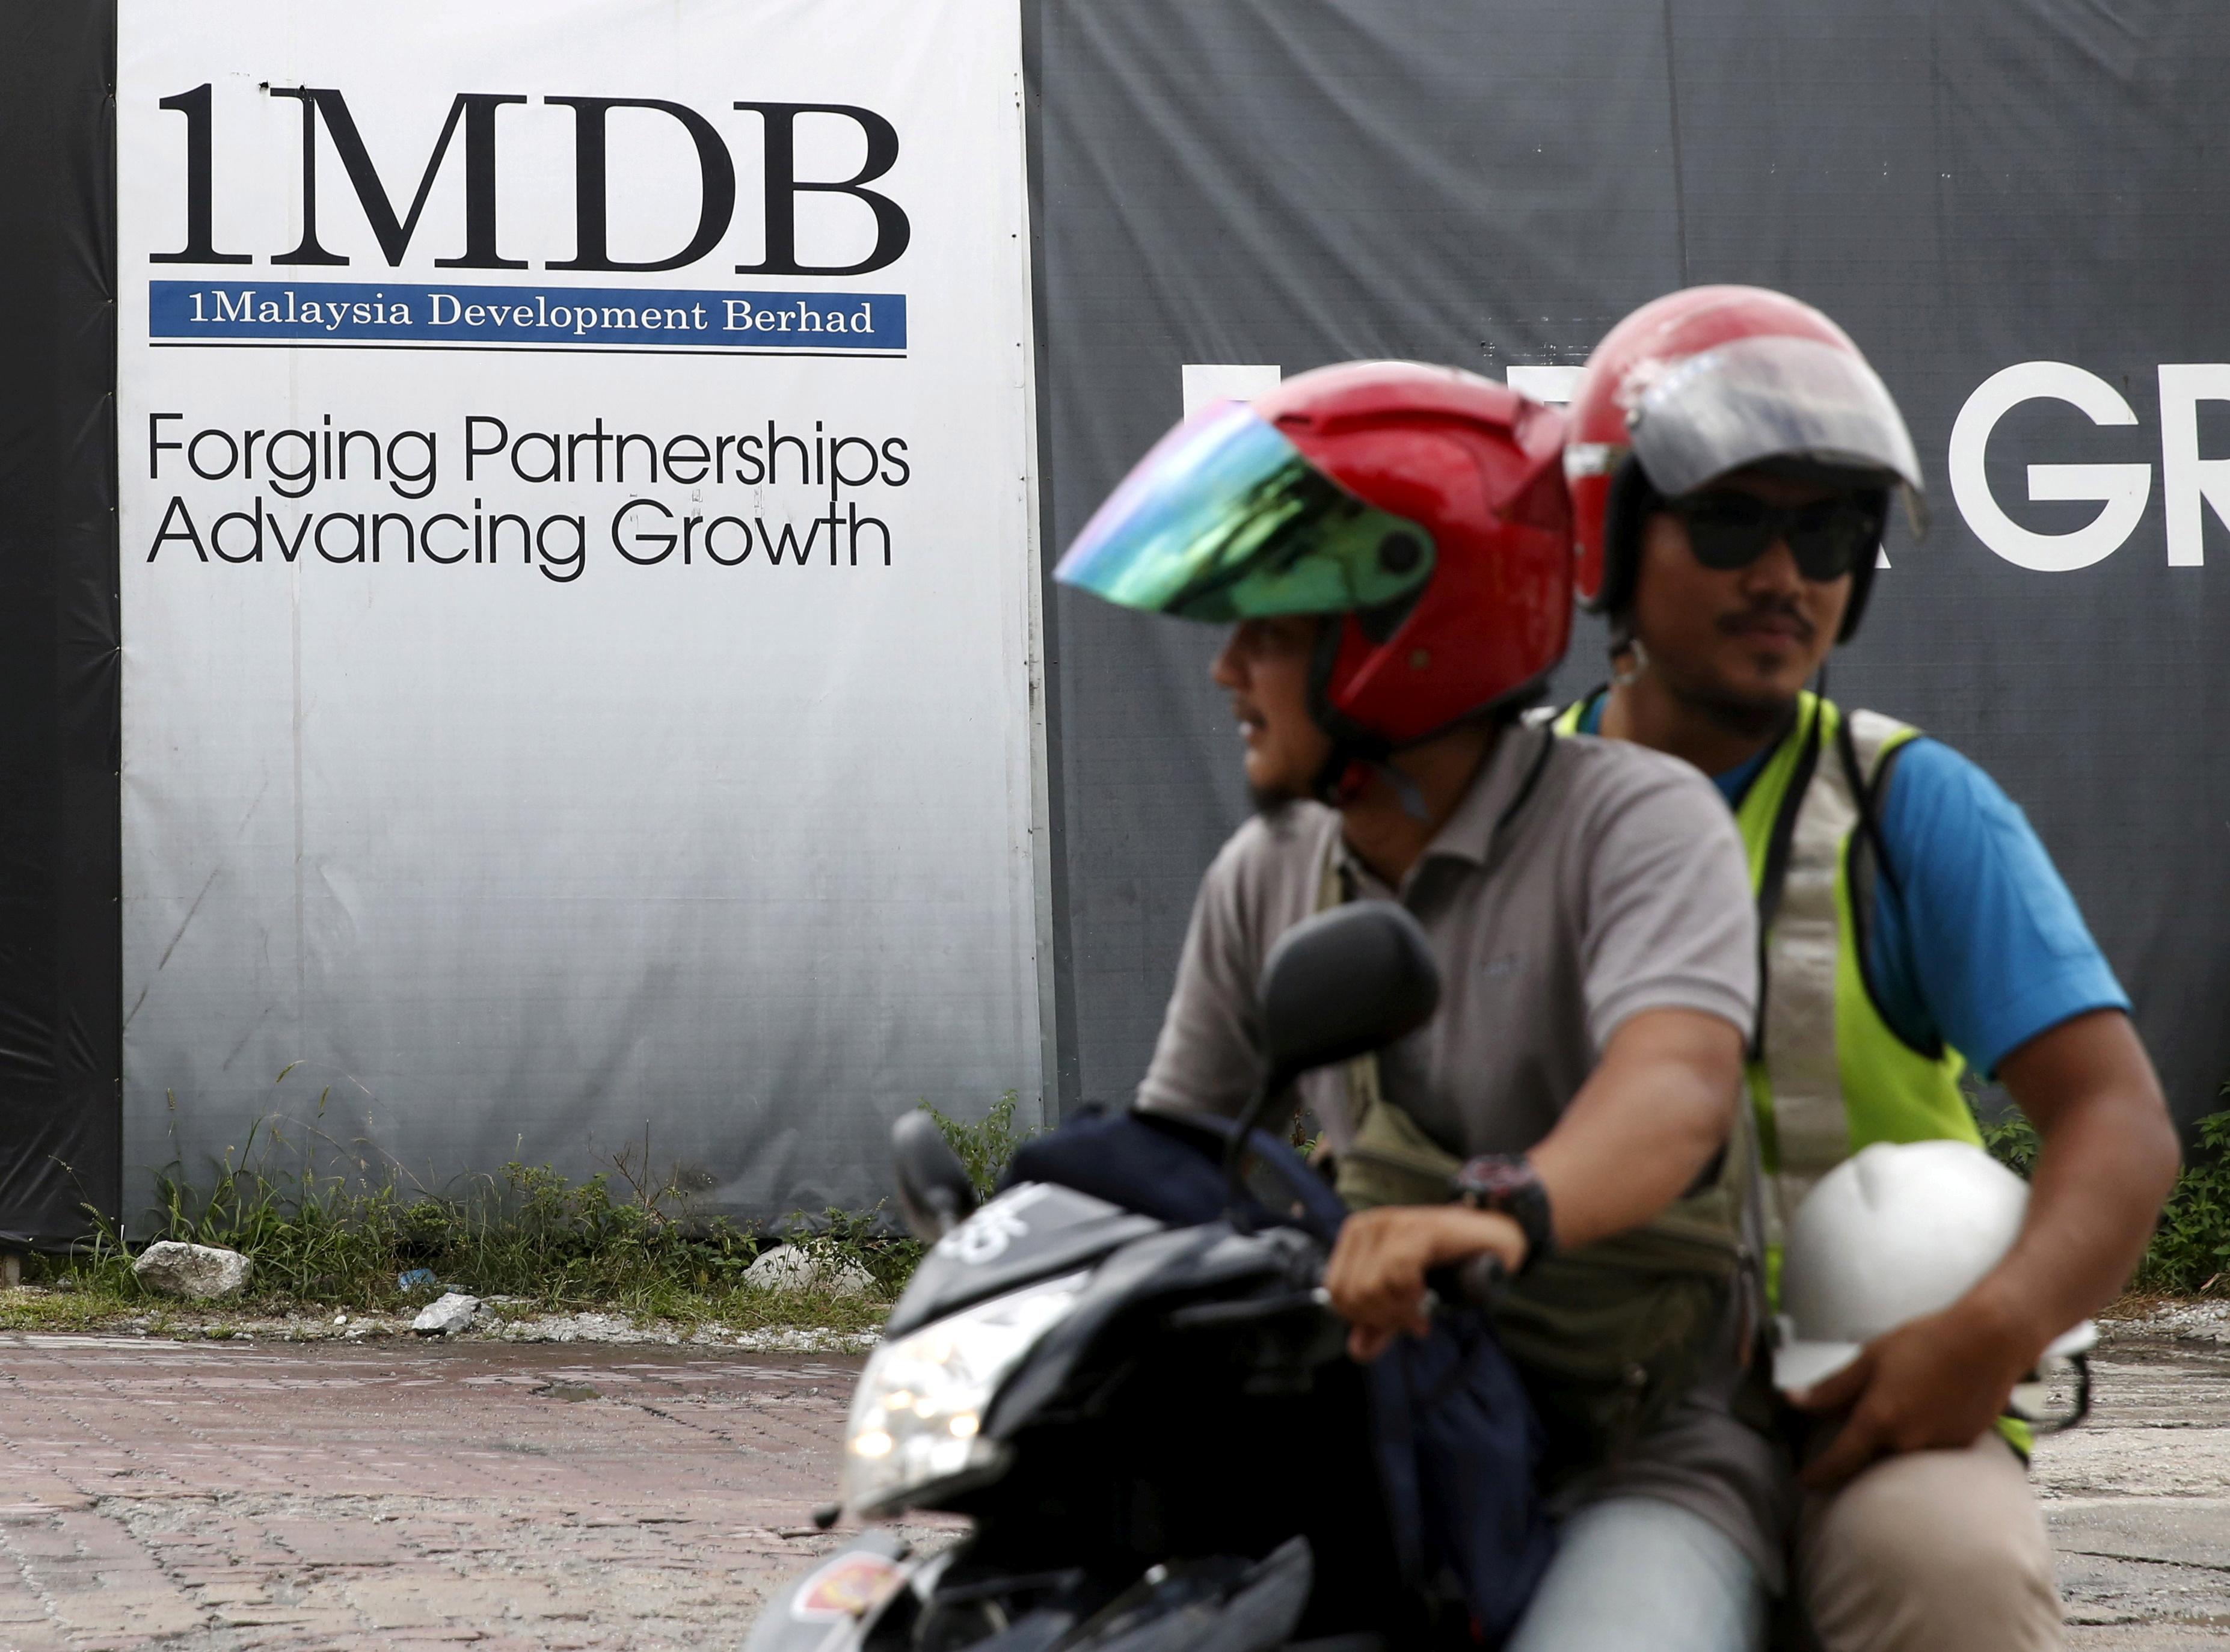 Motorcyclists pass a 1Malaysia Development Berhad (1MDB) billboard at the Tun Razak Exchange development in Kuala Lumpur, Malaysia, February 3, 2016. REUTERS/Olivia Harris